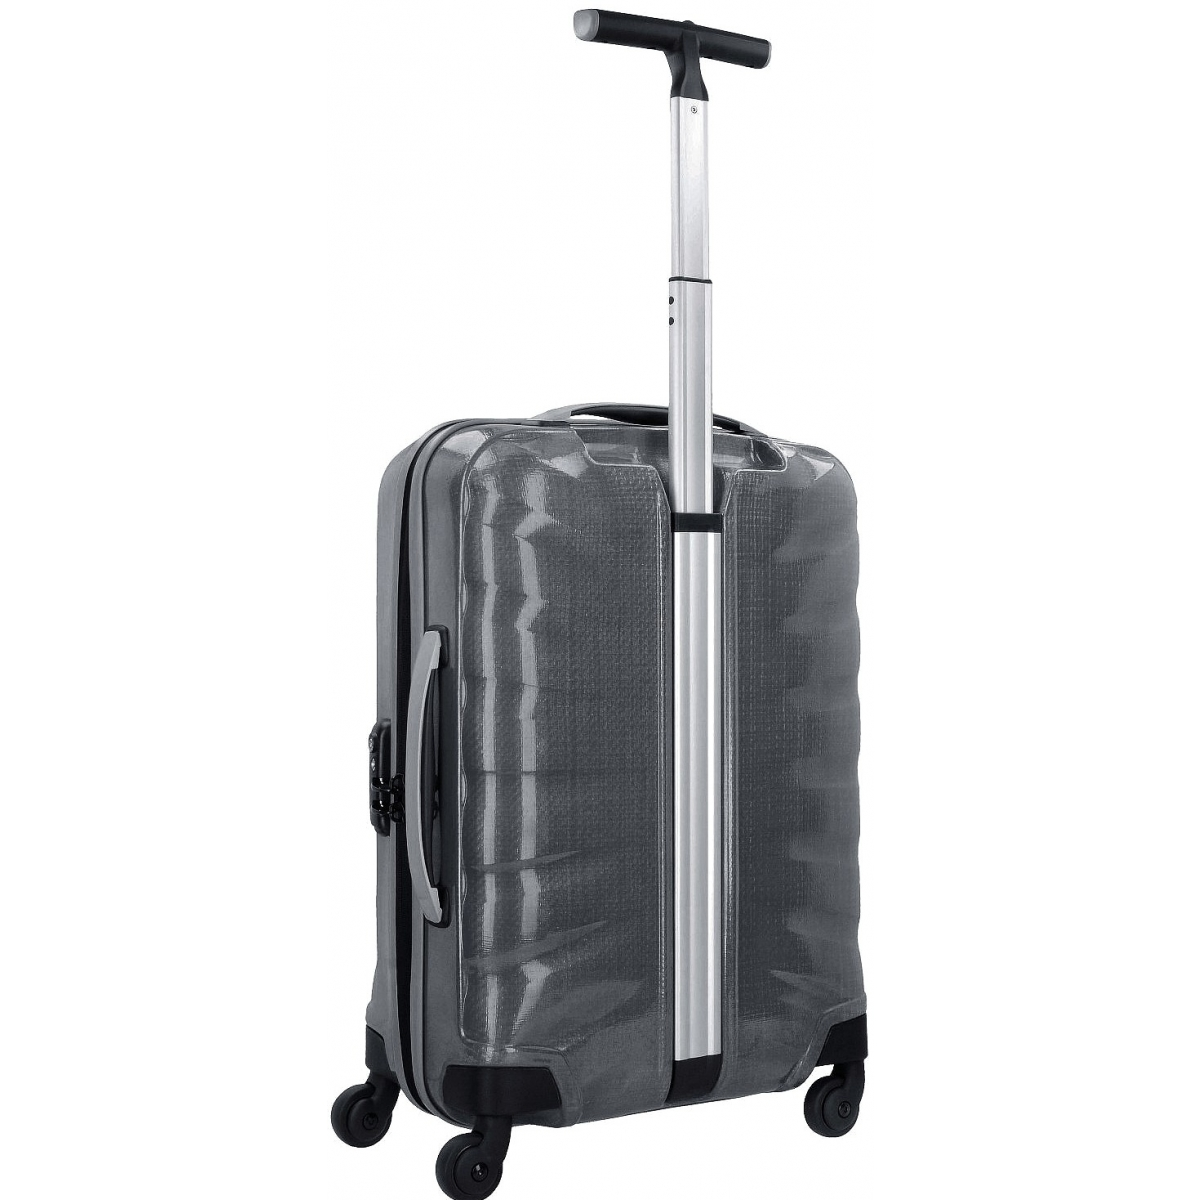 valise samsonite firelite spinner 55 cm gris firelite77 couleur principale gris 11. Black Bedroom Furniture Sets. Home Design Ideas